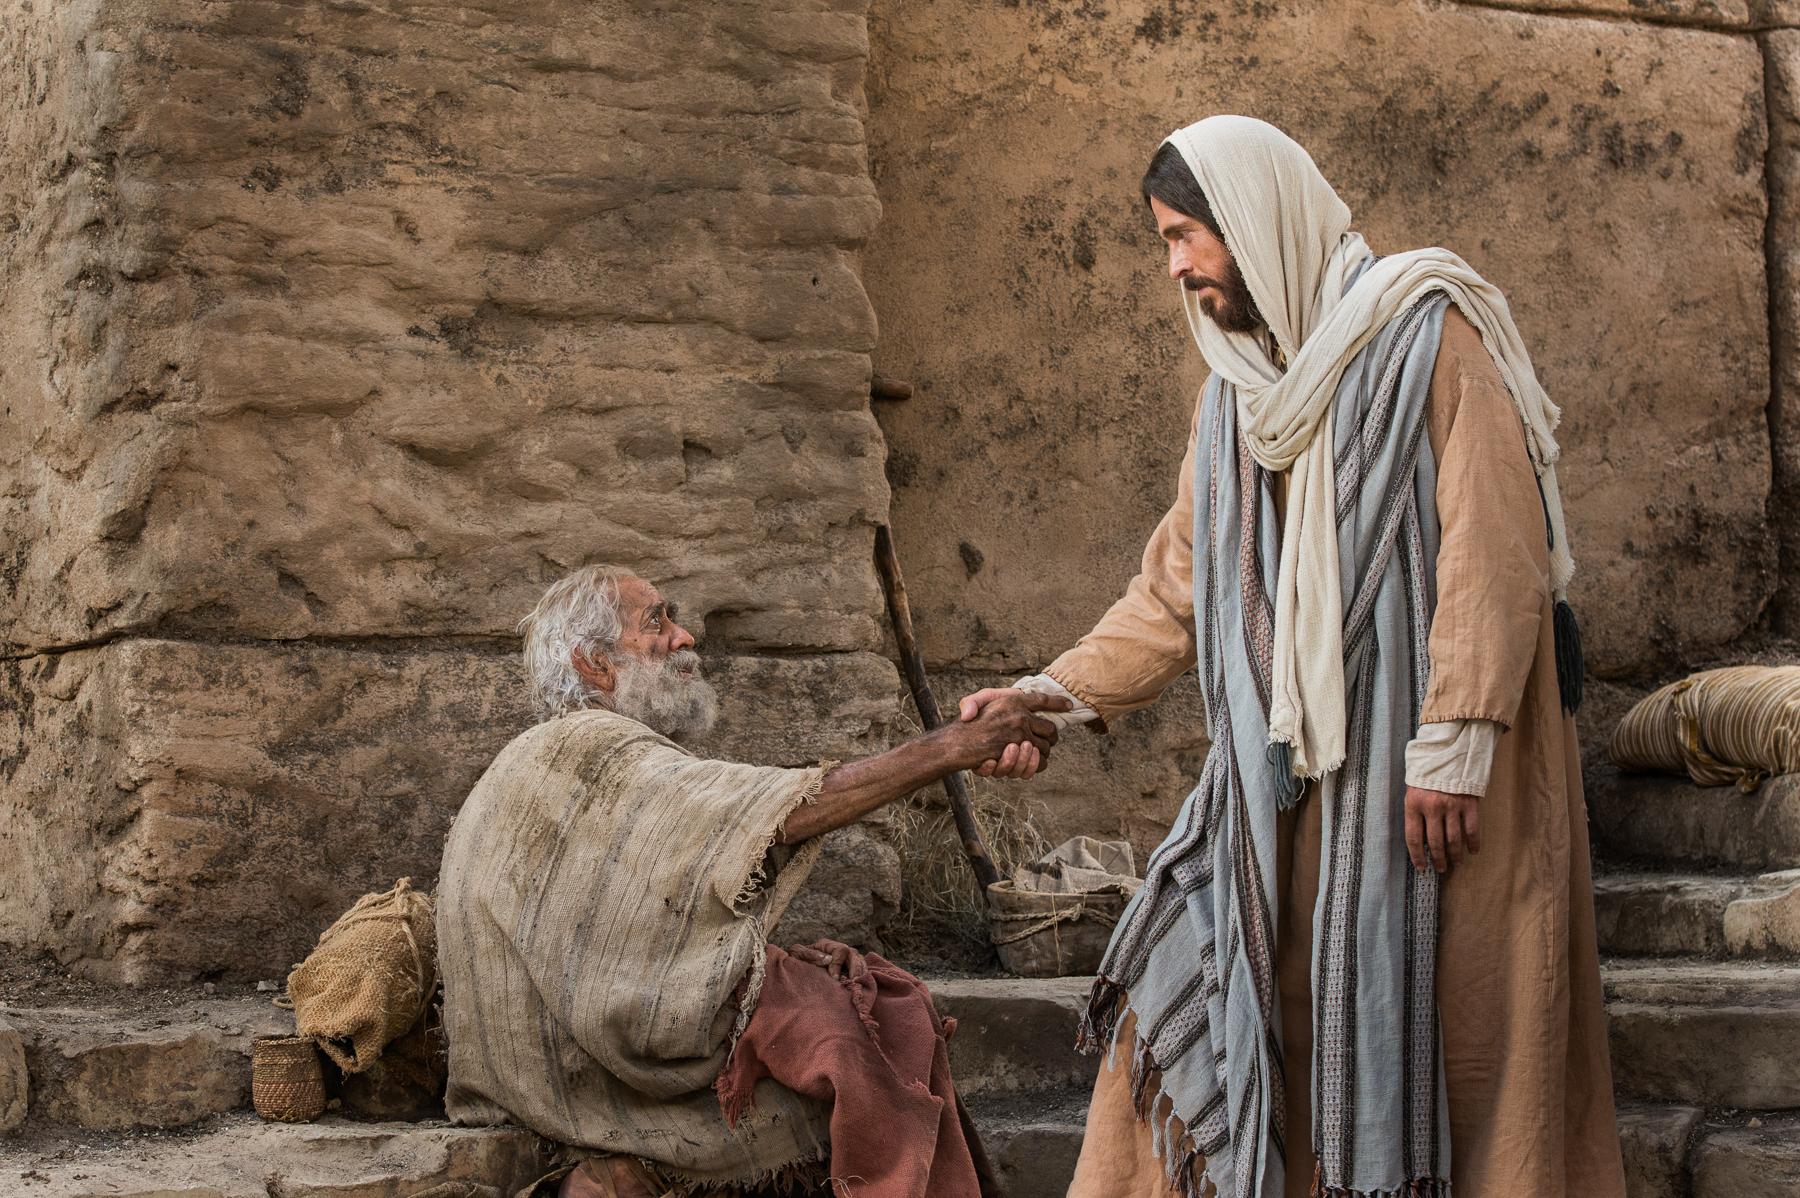 https://www.lds.org/bc/content/bible-videos/videos/jesus-heals-a-lame-man-on-the-sabbath/images/52_jesus-heals-a-lame-man-on-the-sabbath_1800x1200_300dpi_2.jpg